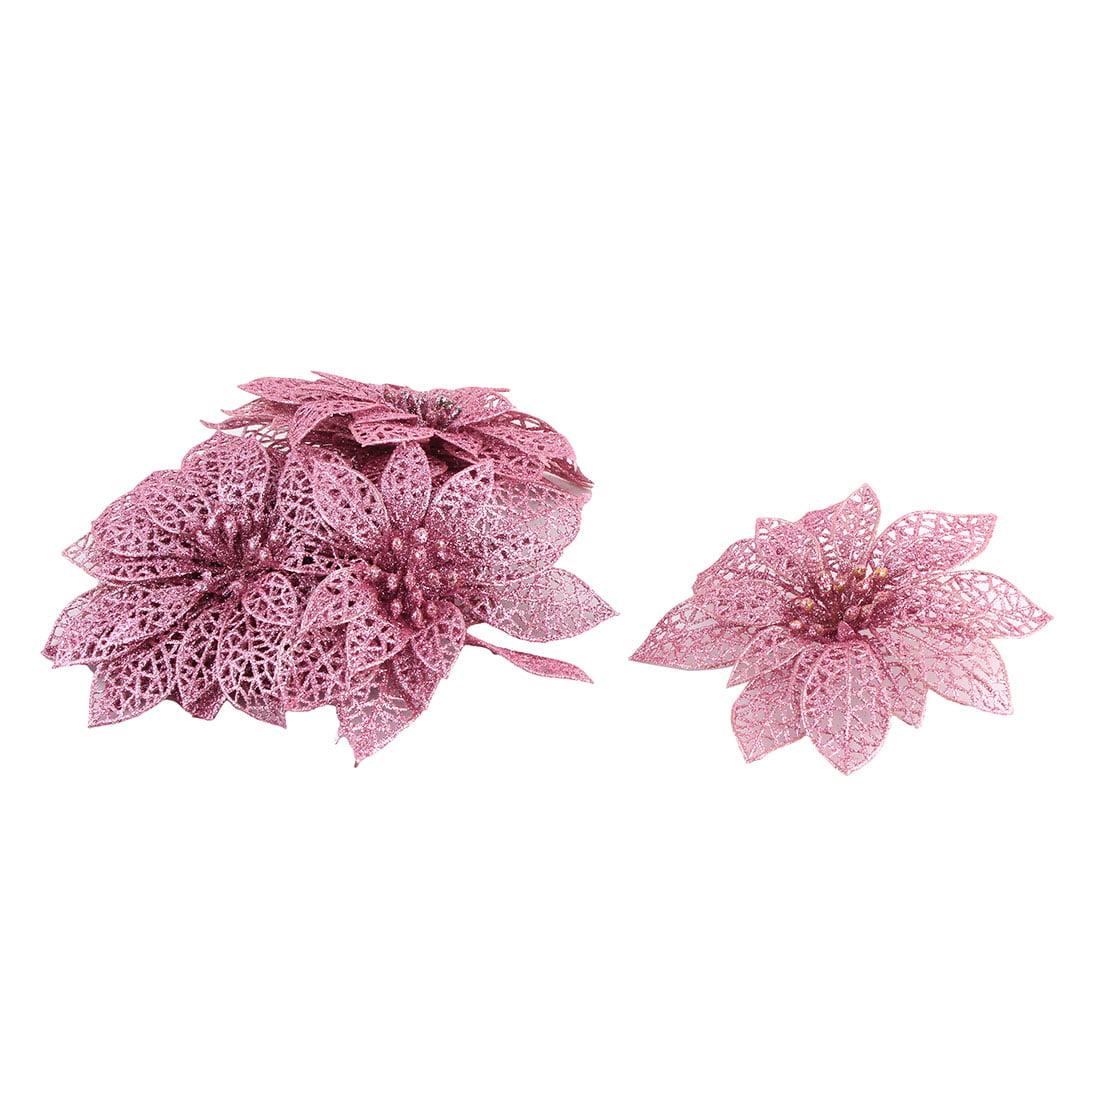 Unique BargainsHome Christmas Tree Artificial Glitter Hanging Ornaments Flower Pink 10 PCS